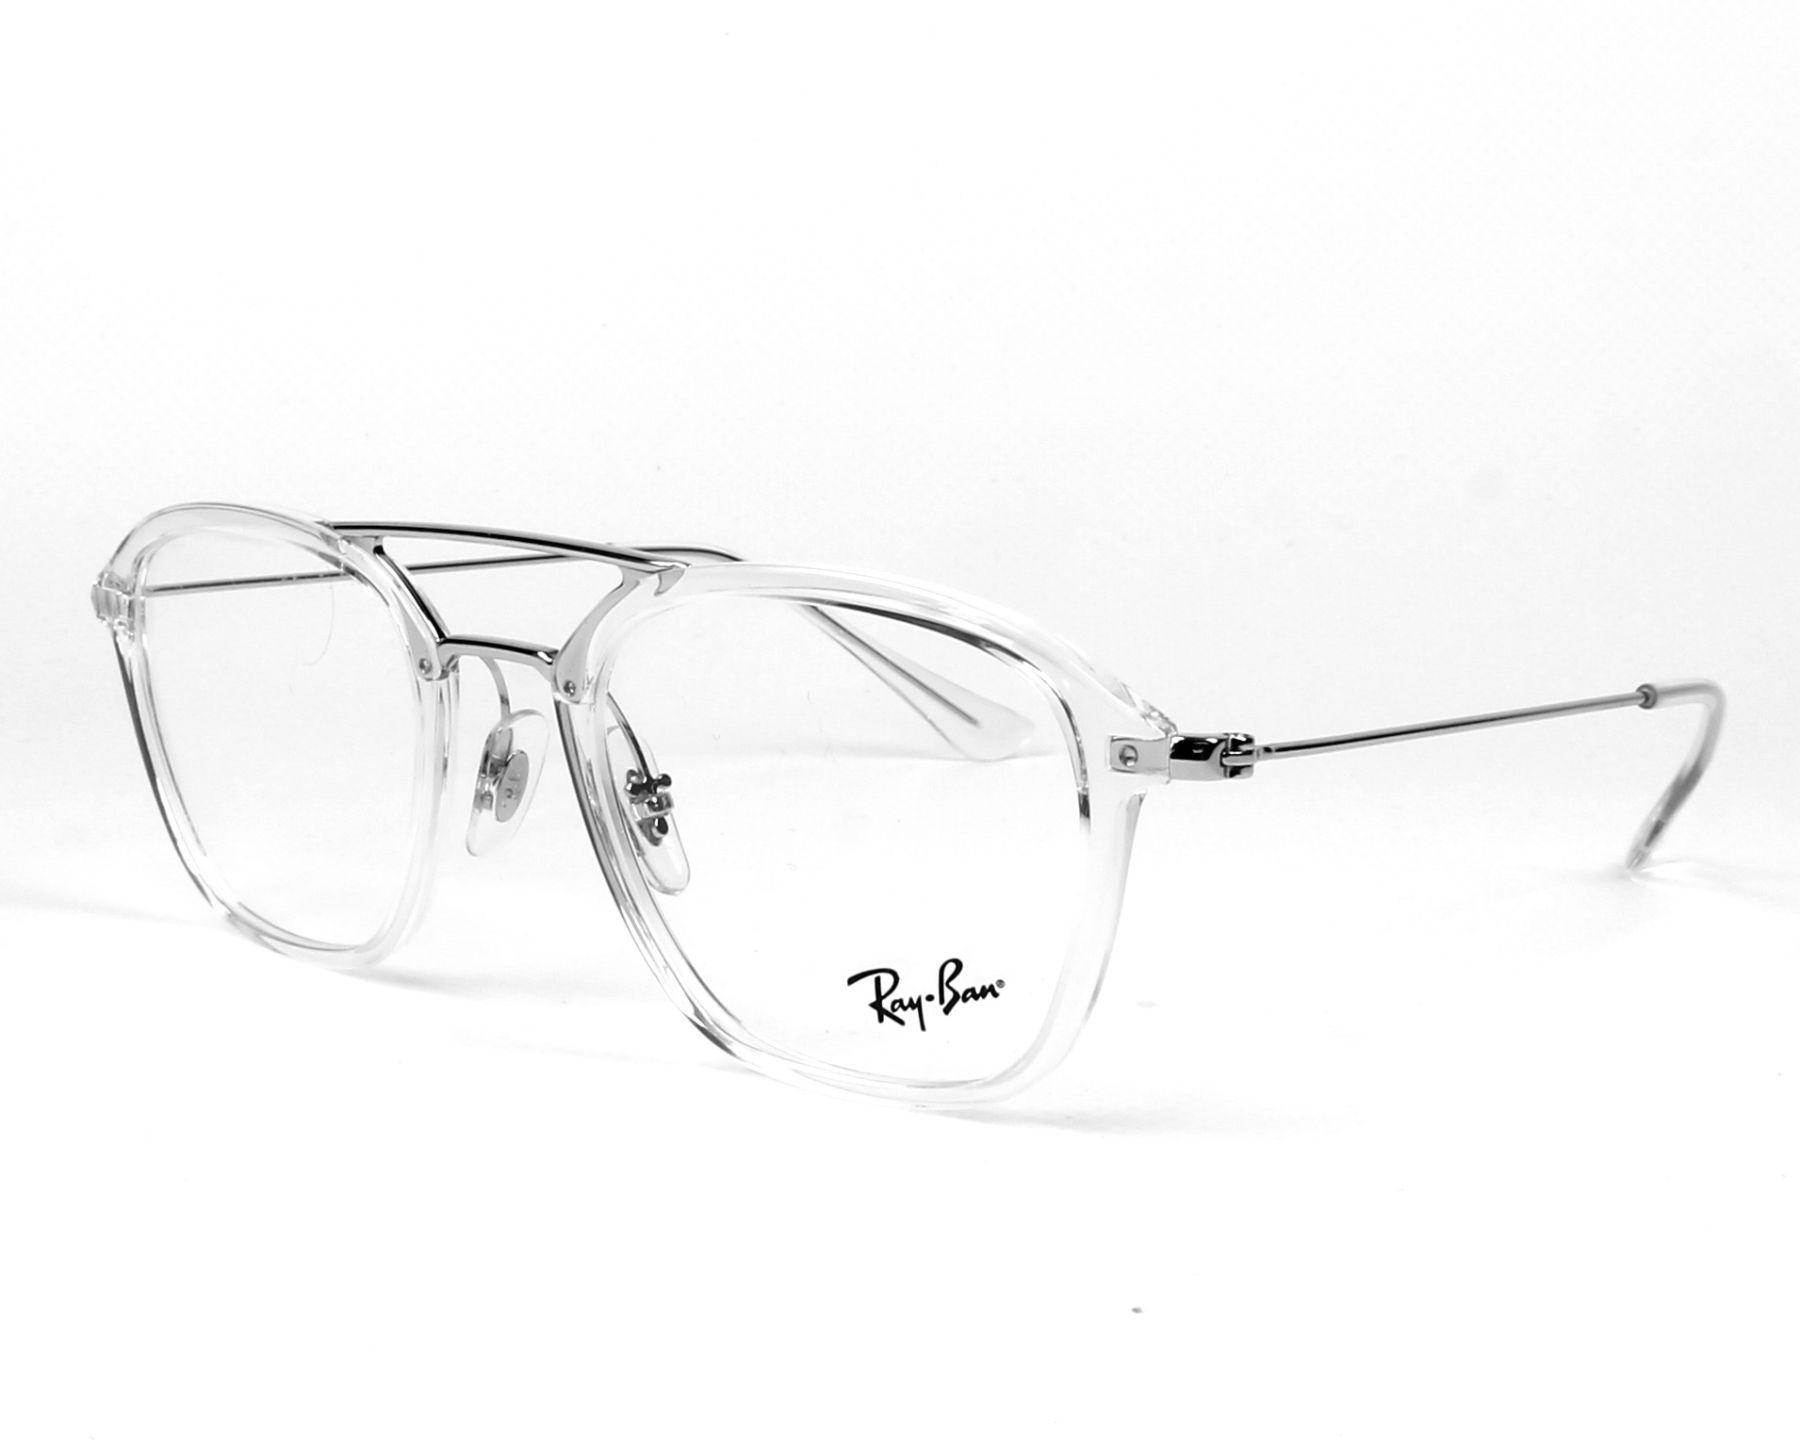 achat lunettes de vue ray ban rx 7098 2001 visionet. Black Bedroom Furniture Sets. Home Design Ideas